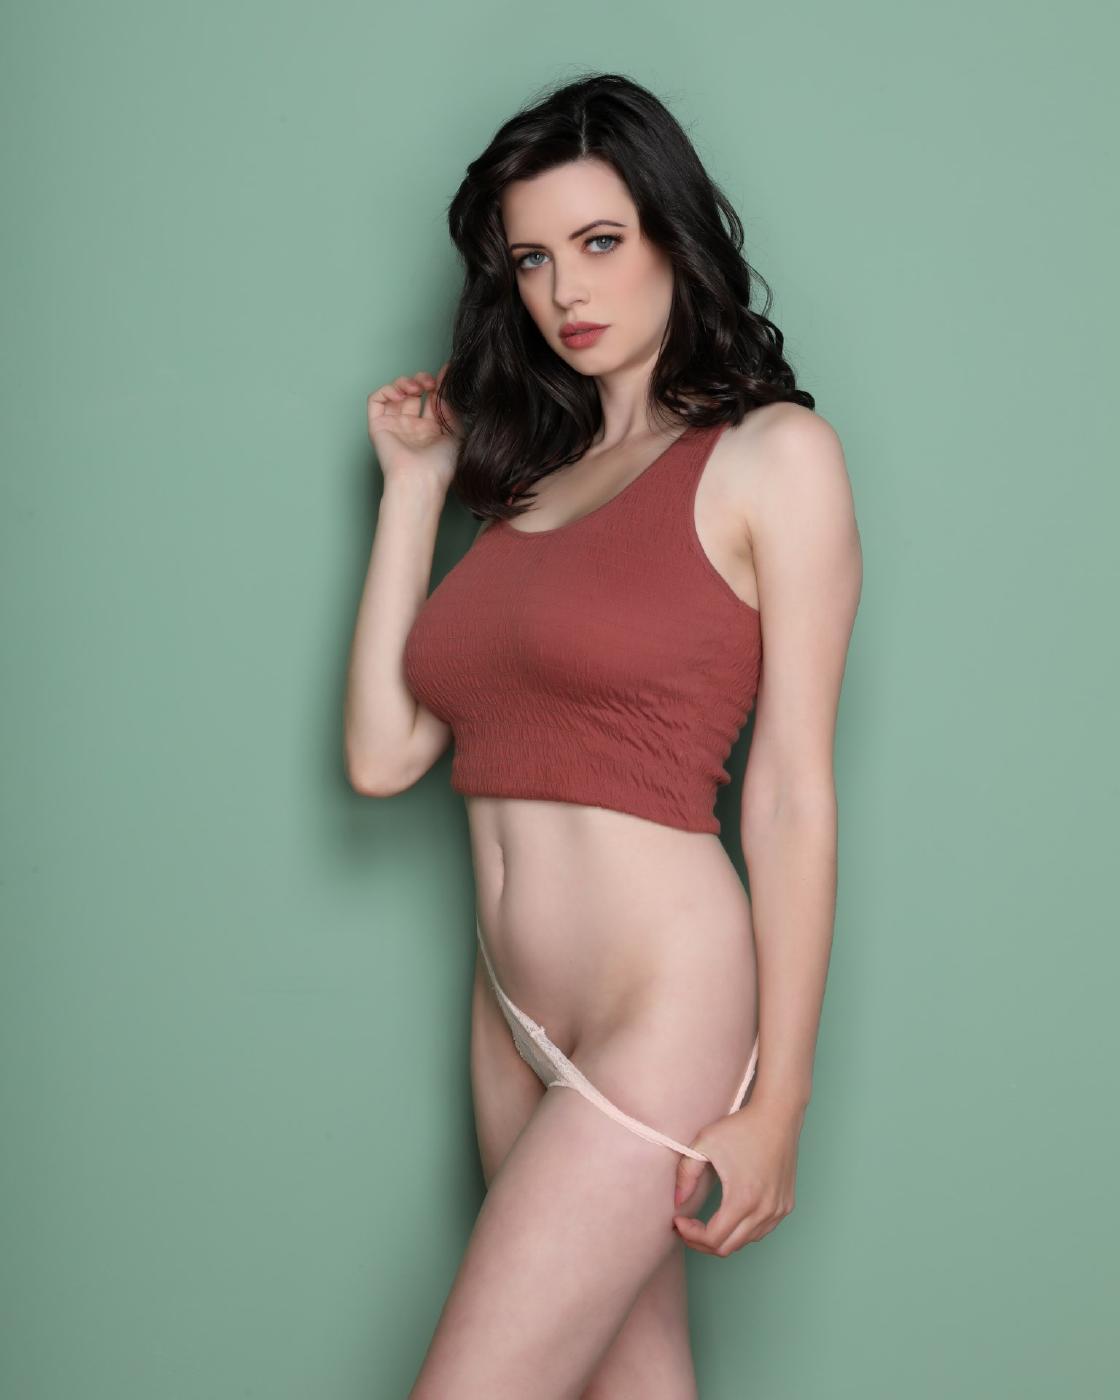 Sam Paige Nude Strip Photoshoot Onlyfans Set Leaked Rrqnmb